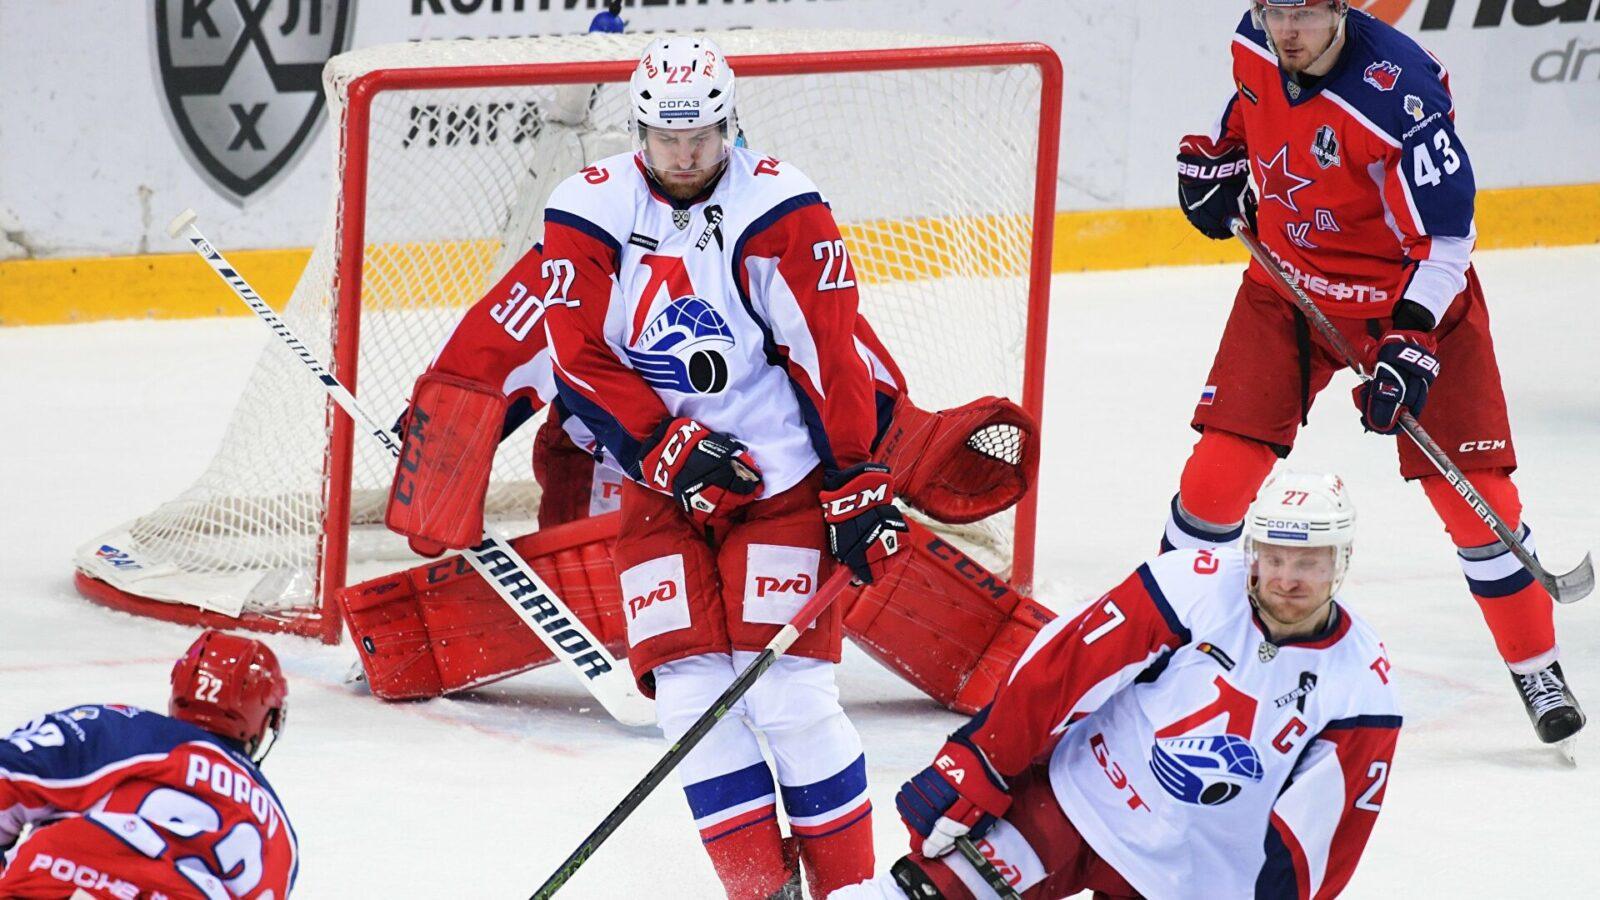 ЦСКА оказался сильнее Локомотива в битве фаворитов КХЛ